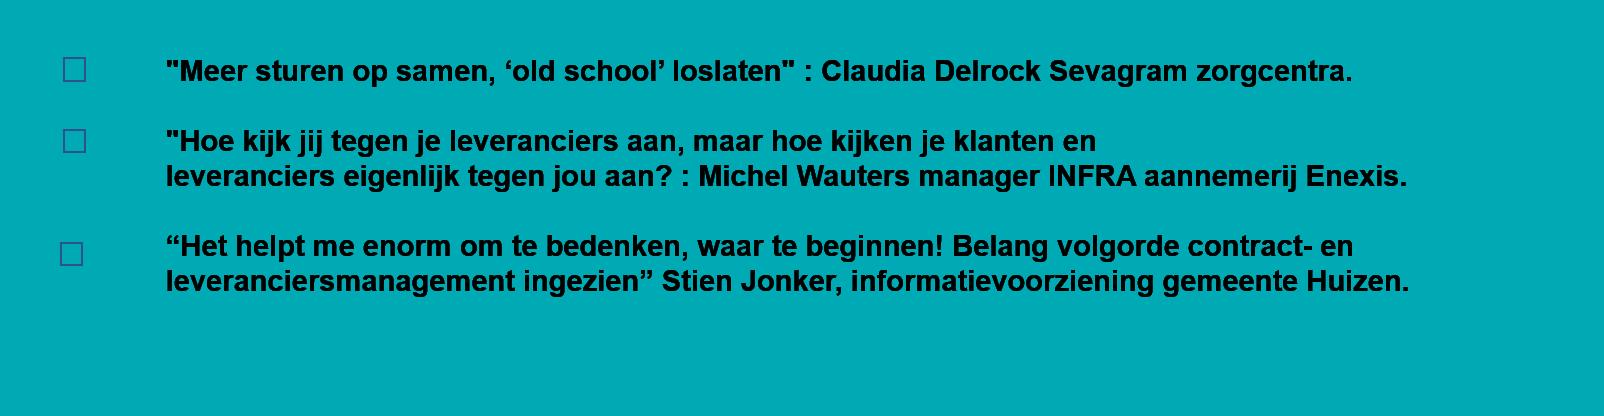 CM-en-LM-referenties-najaar-2019.png#asset:7746